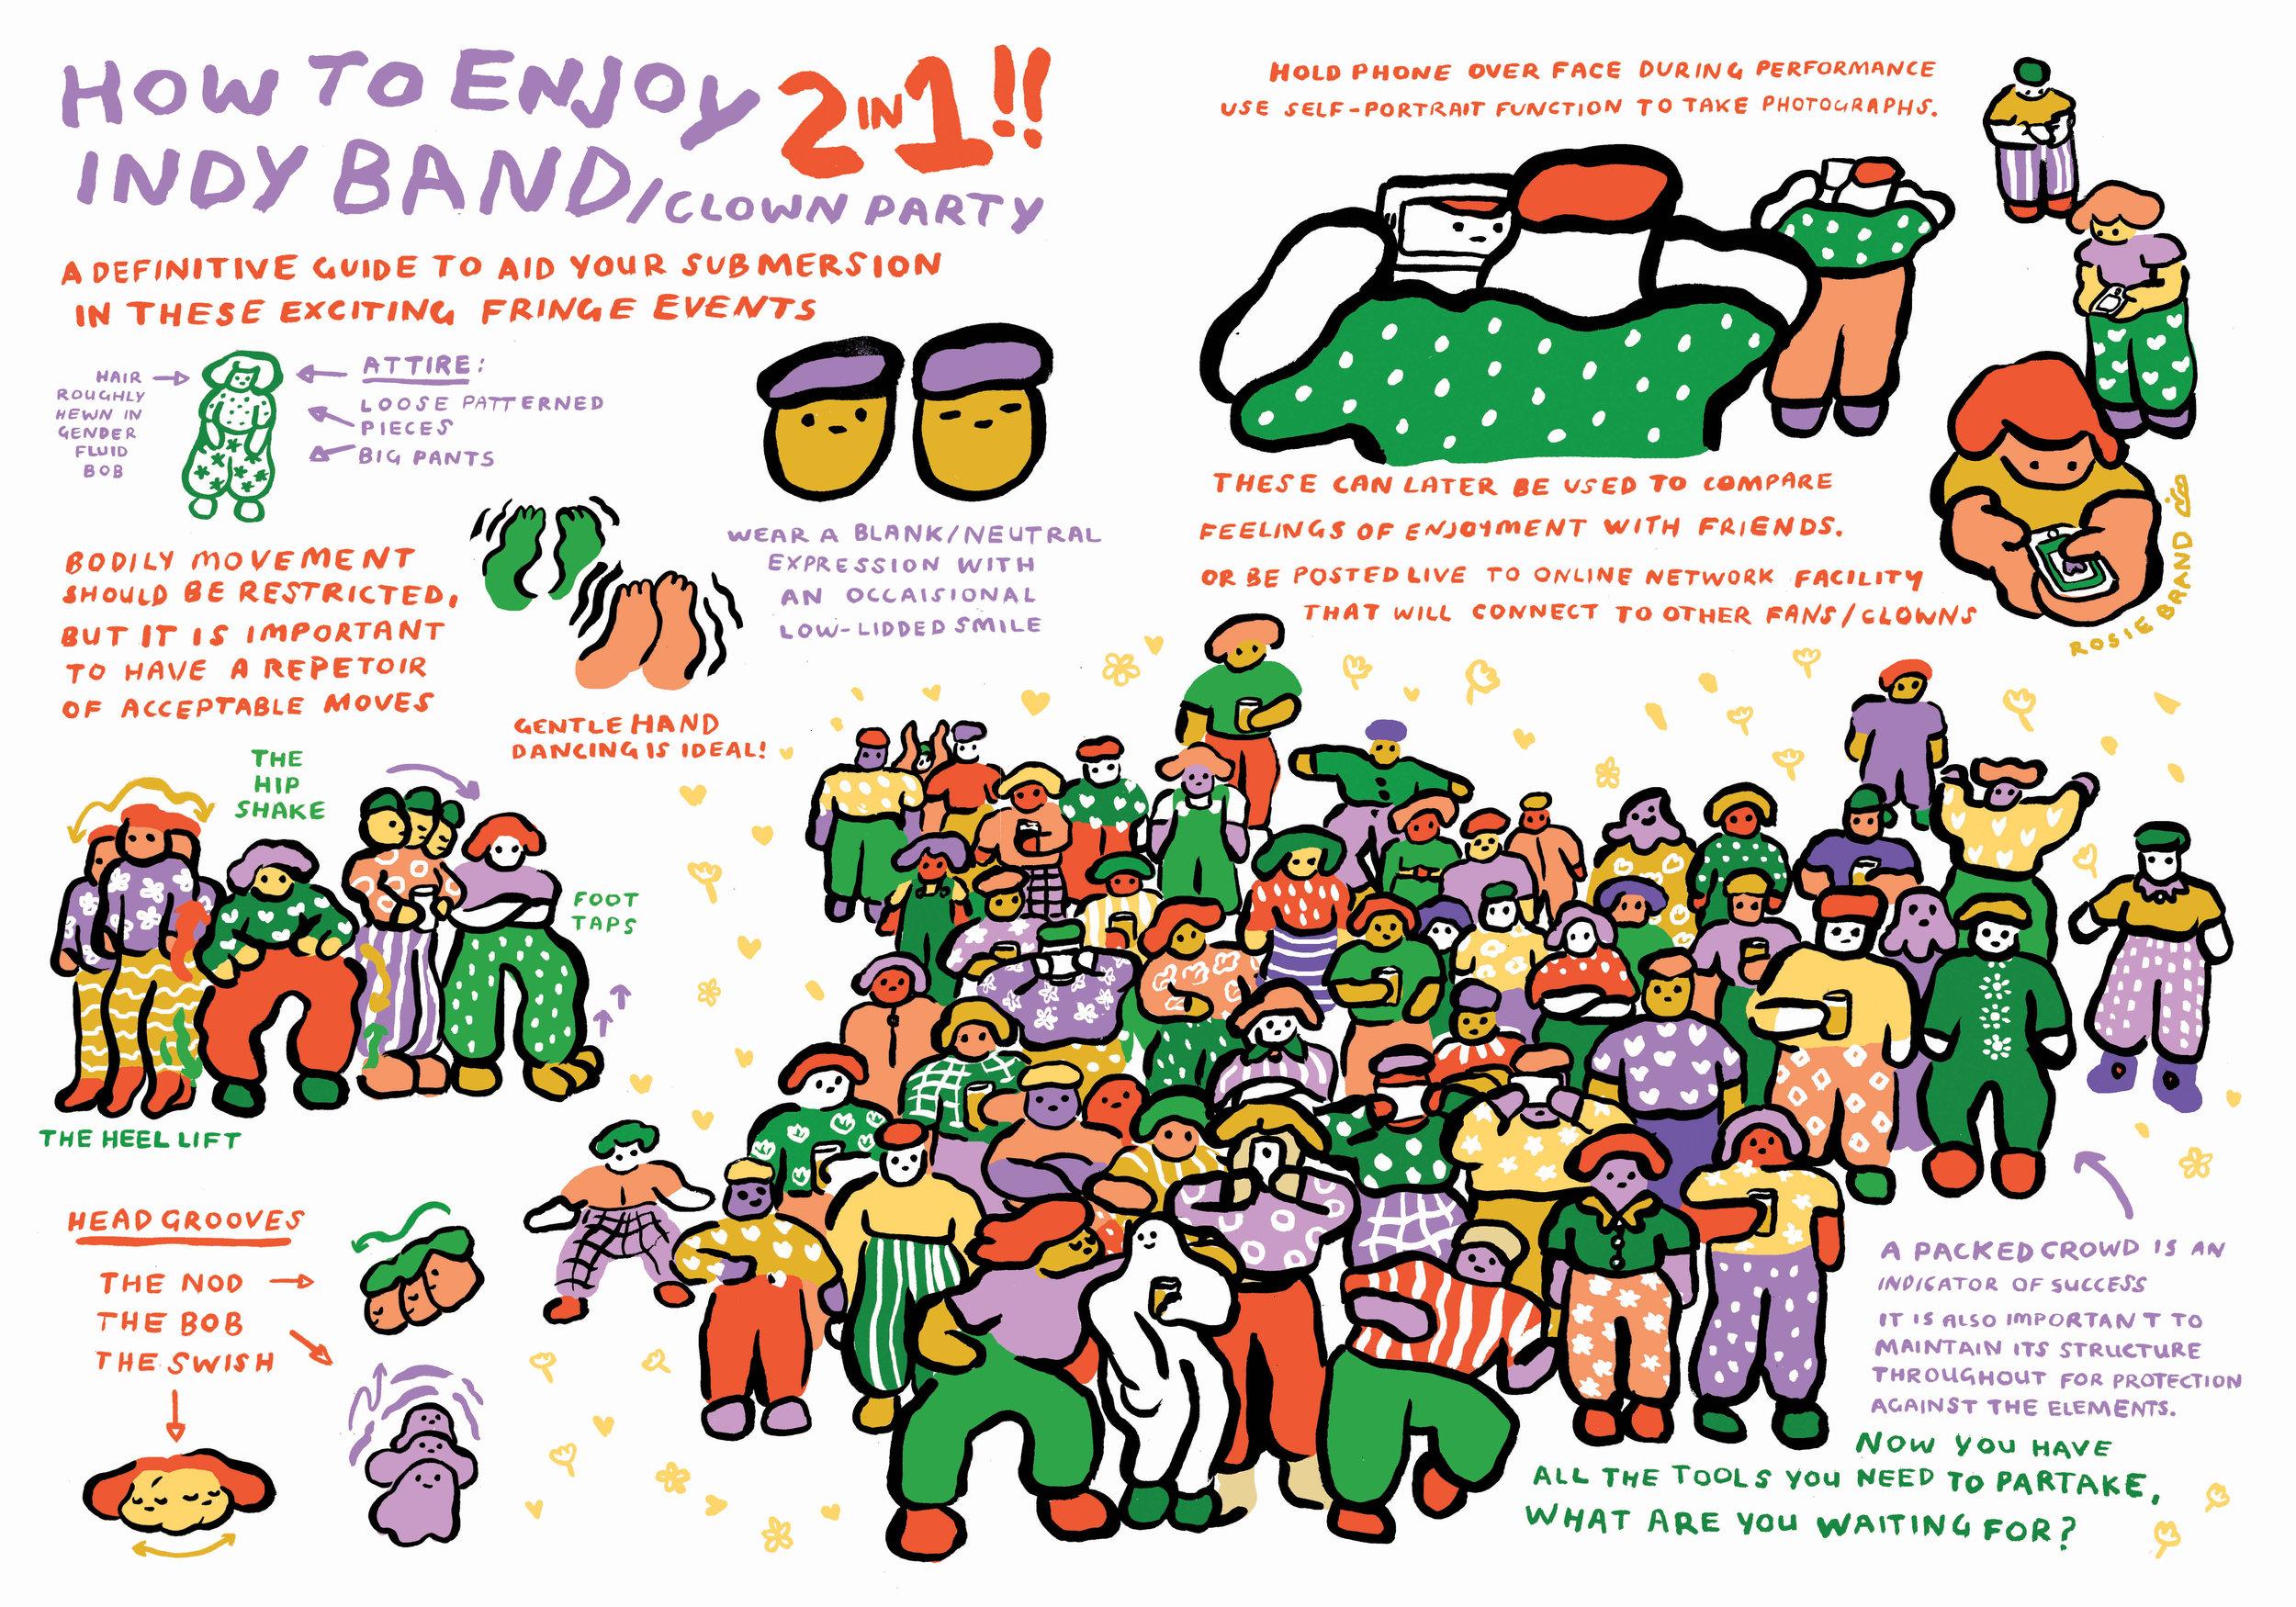 indyband clown party rgb.jpg